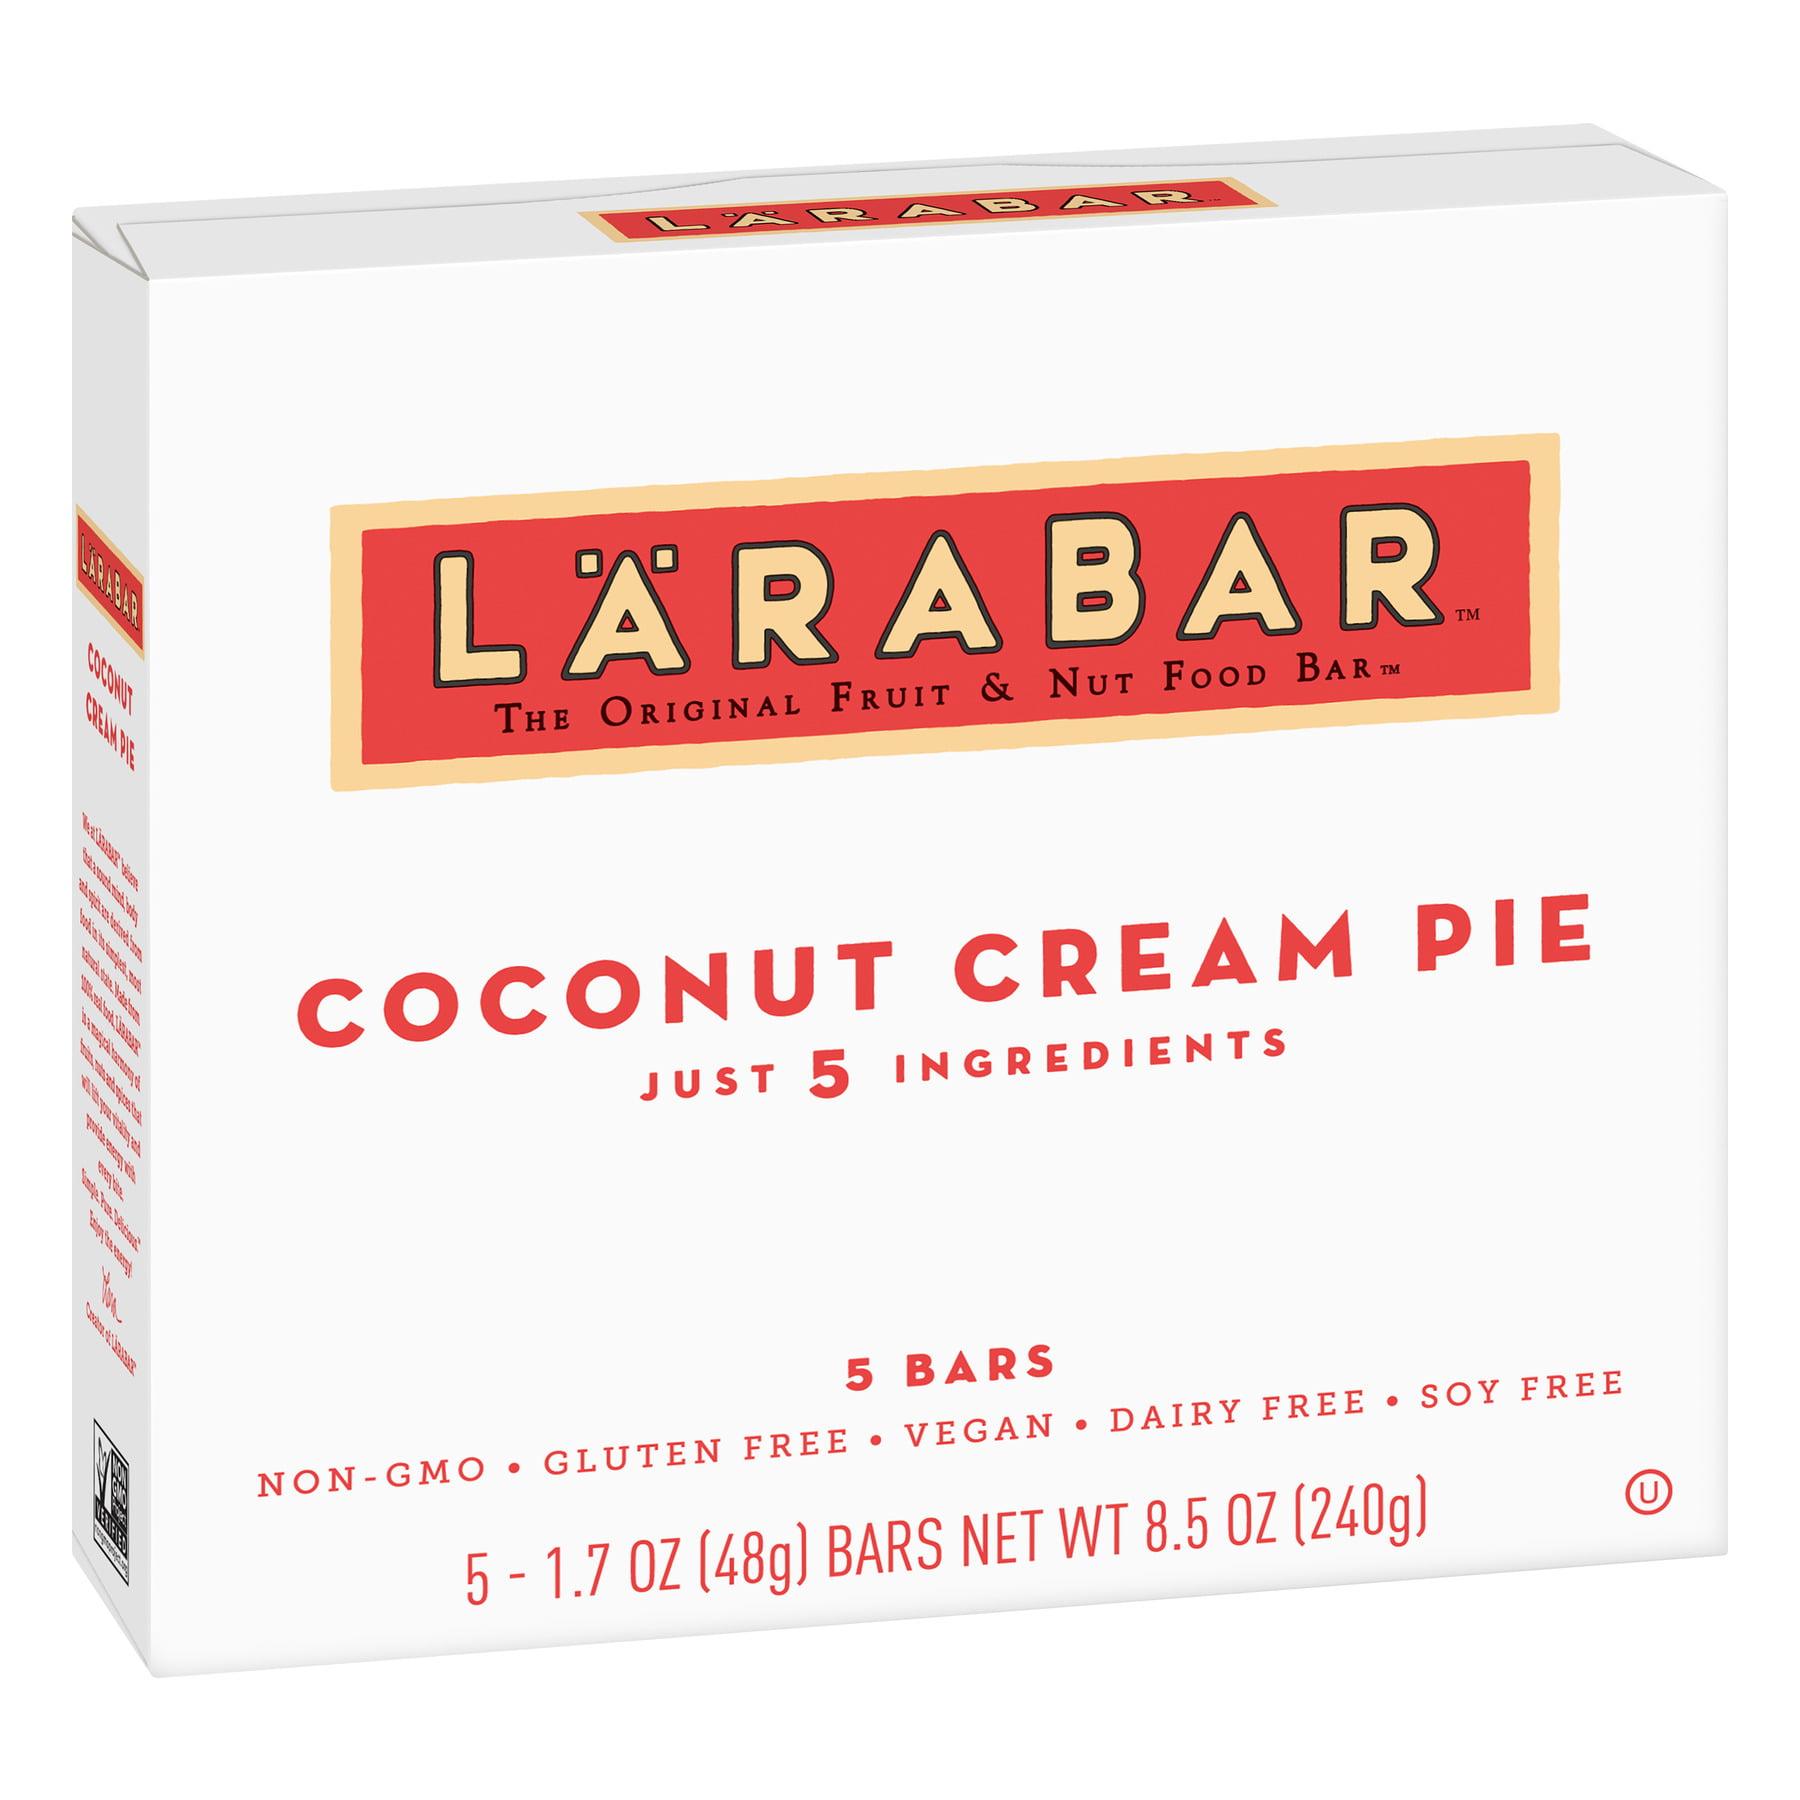 Larabar Gluten Free Coconut Cream Pie Fruit and Nut  Bars 5 ct, 8.5 oz